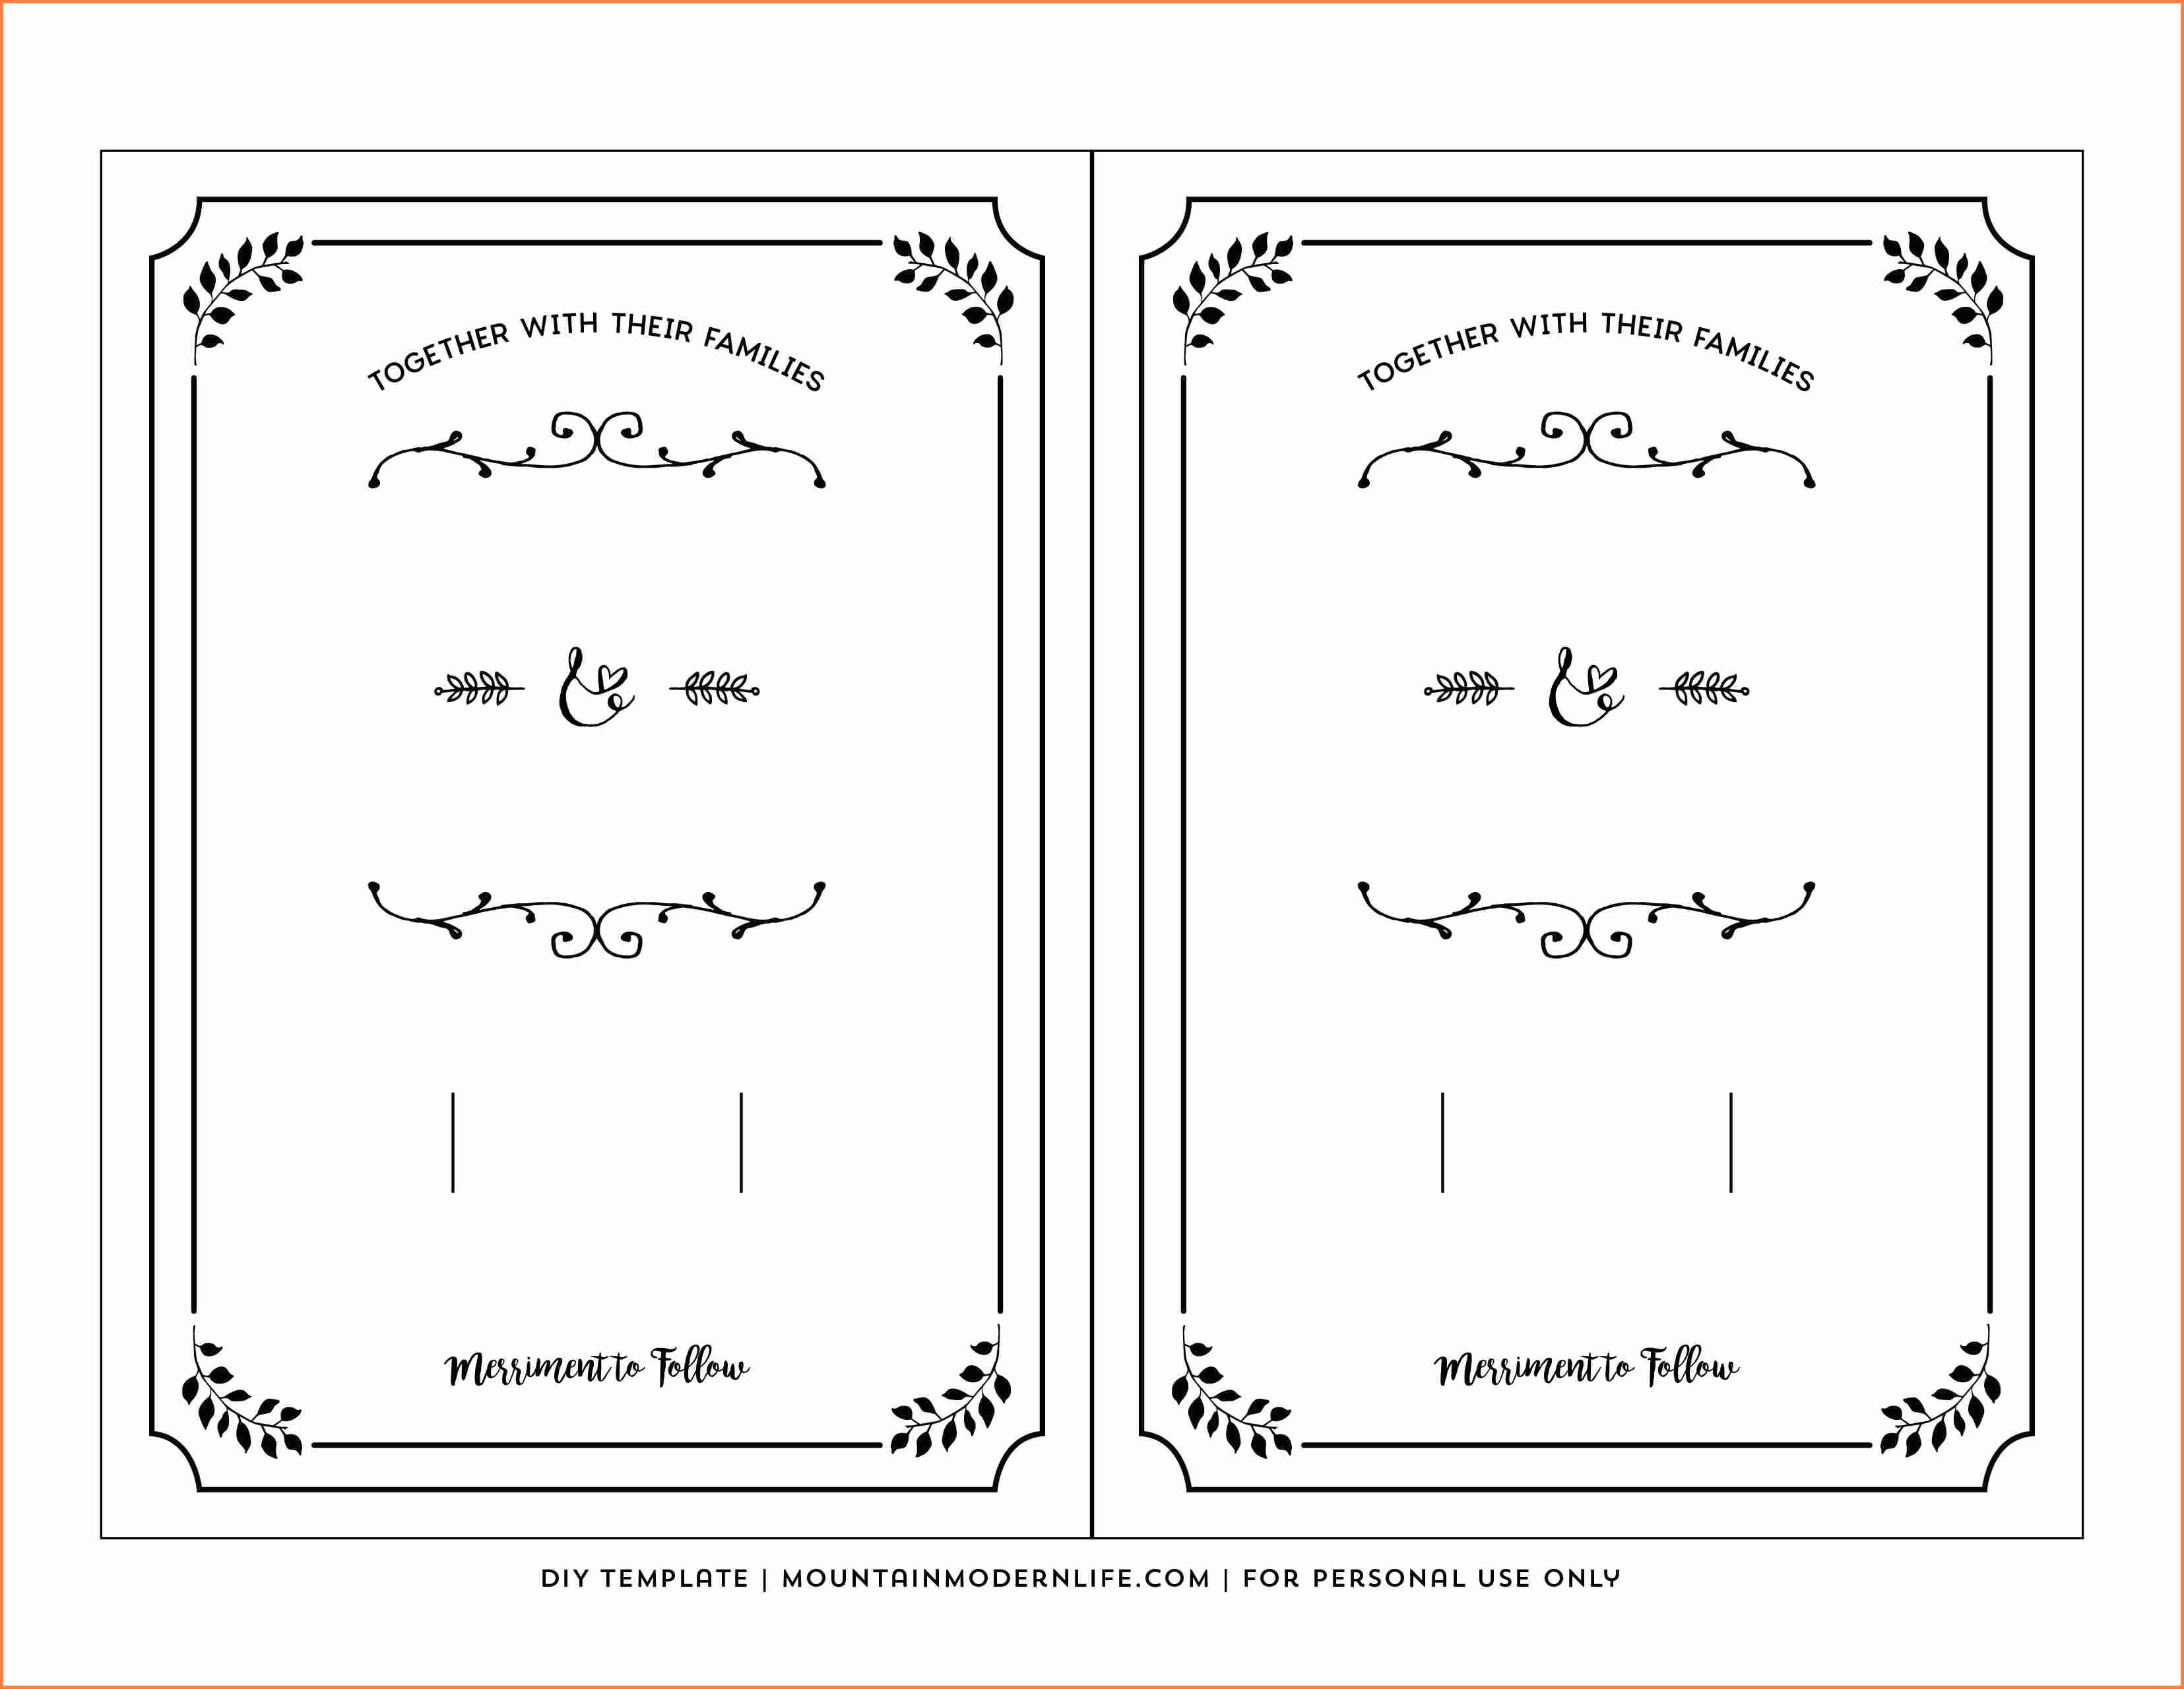 15+ Free Printable Invitation Templates | Restaurant Receipt - Free Printable Invitations Templates